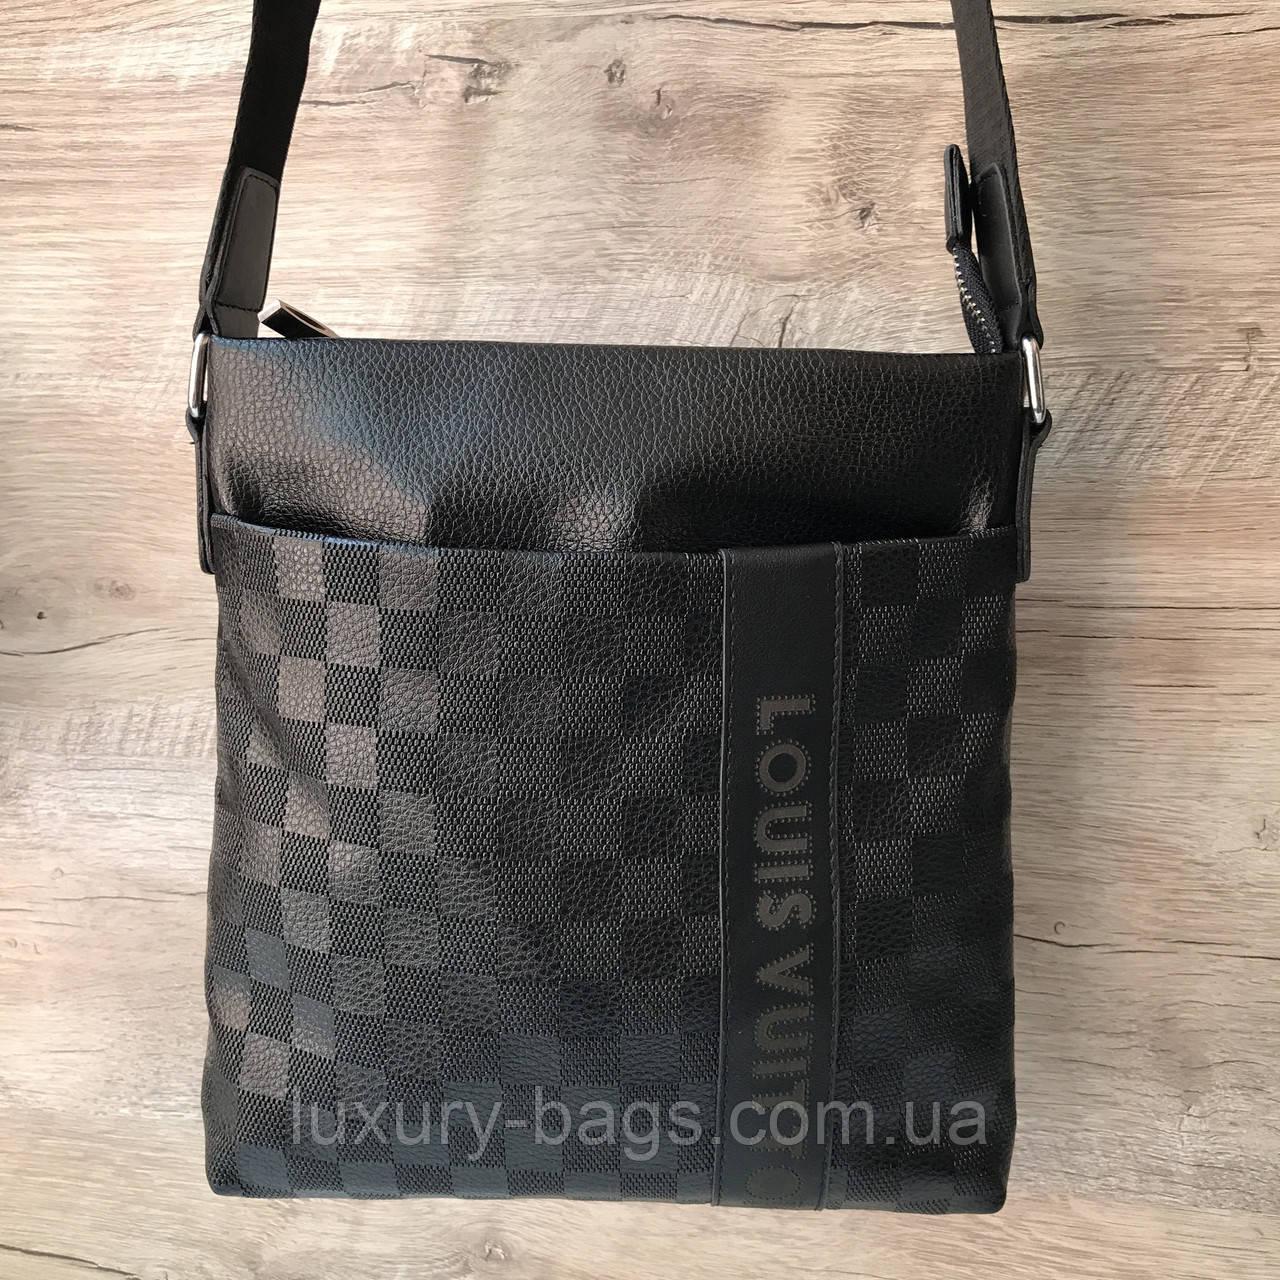 525935009d14 Мужская сумка планшетка Louis Vuitton Луи Виттон через плечо - BaGsInTrend  в Одессе